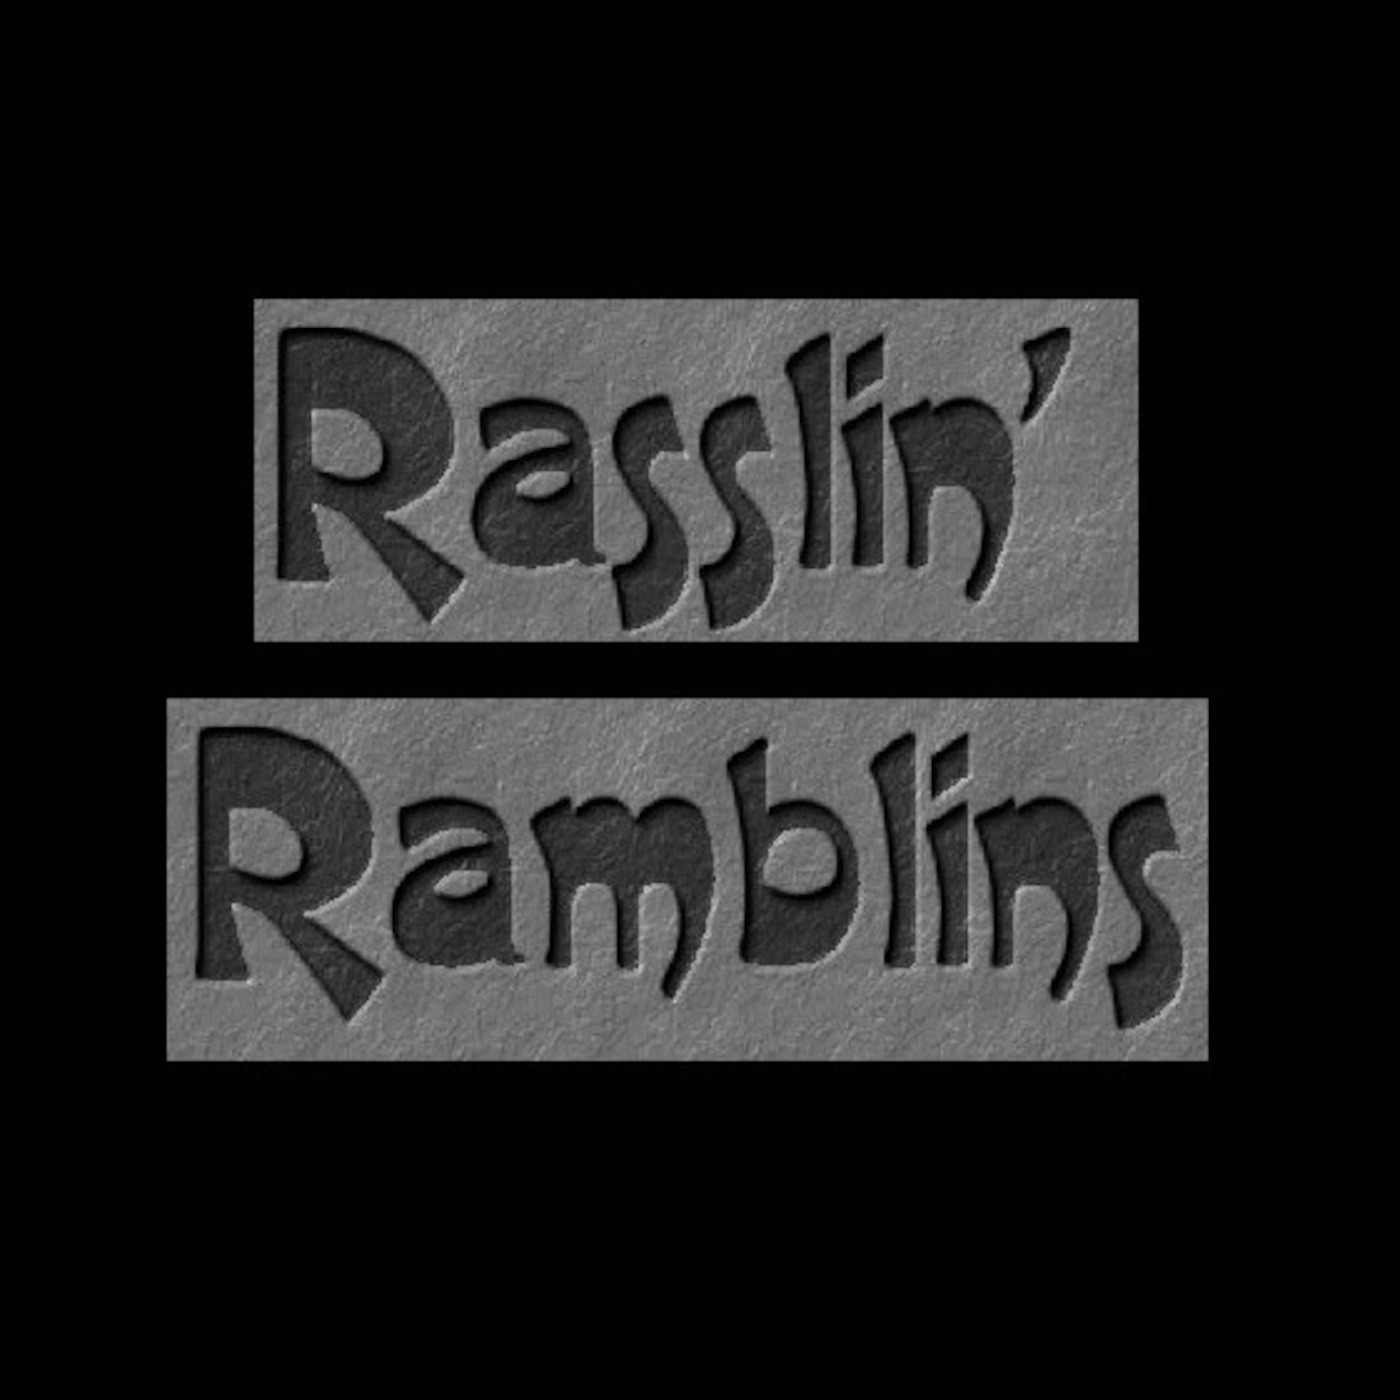 Rasslin' Ramblins